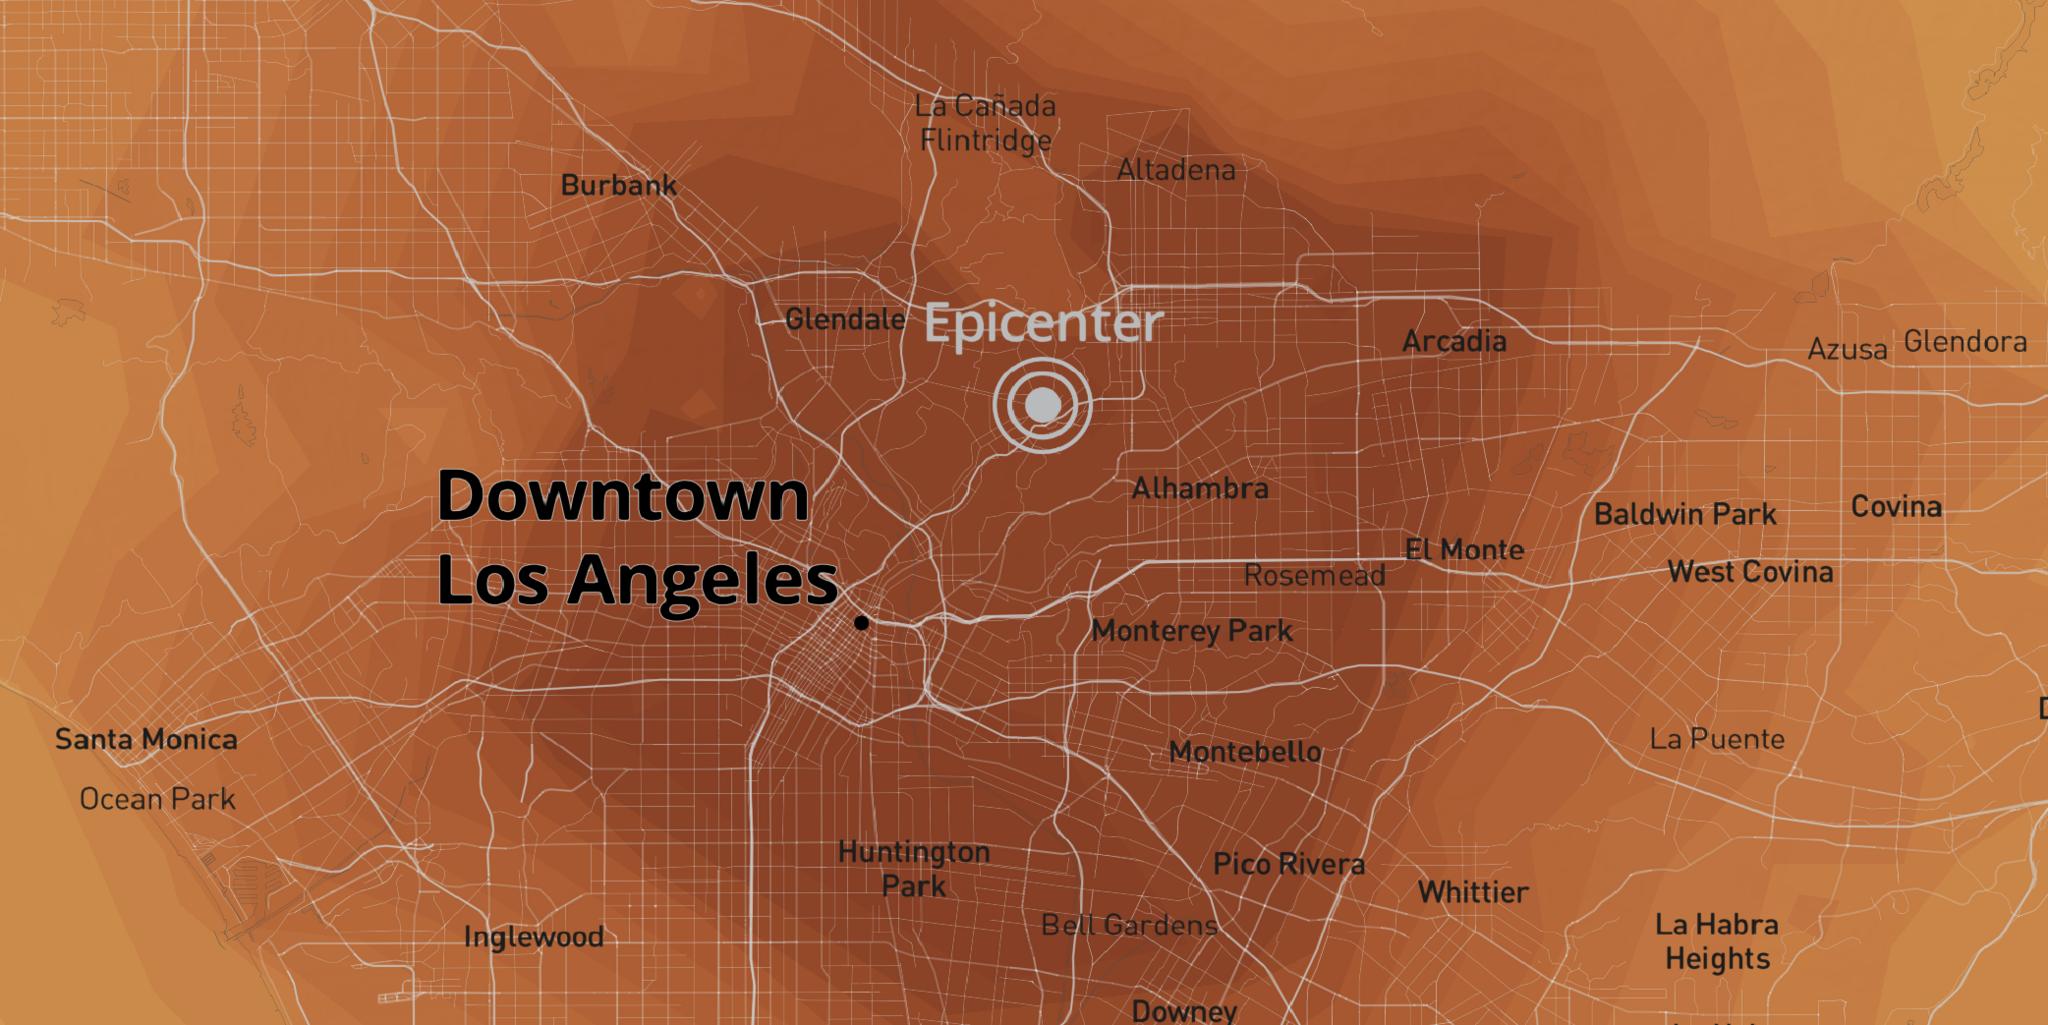 What would a powerful earthquake feel like where you live?